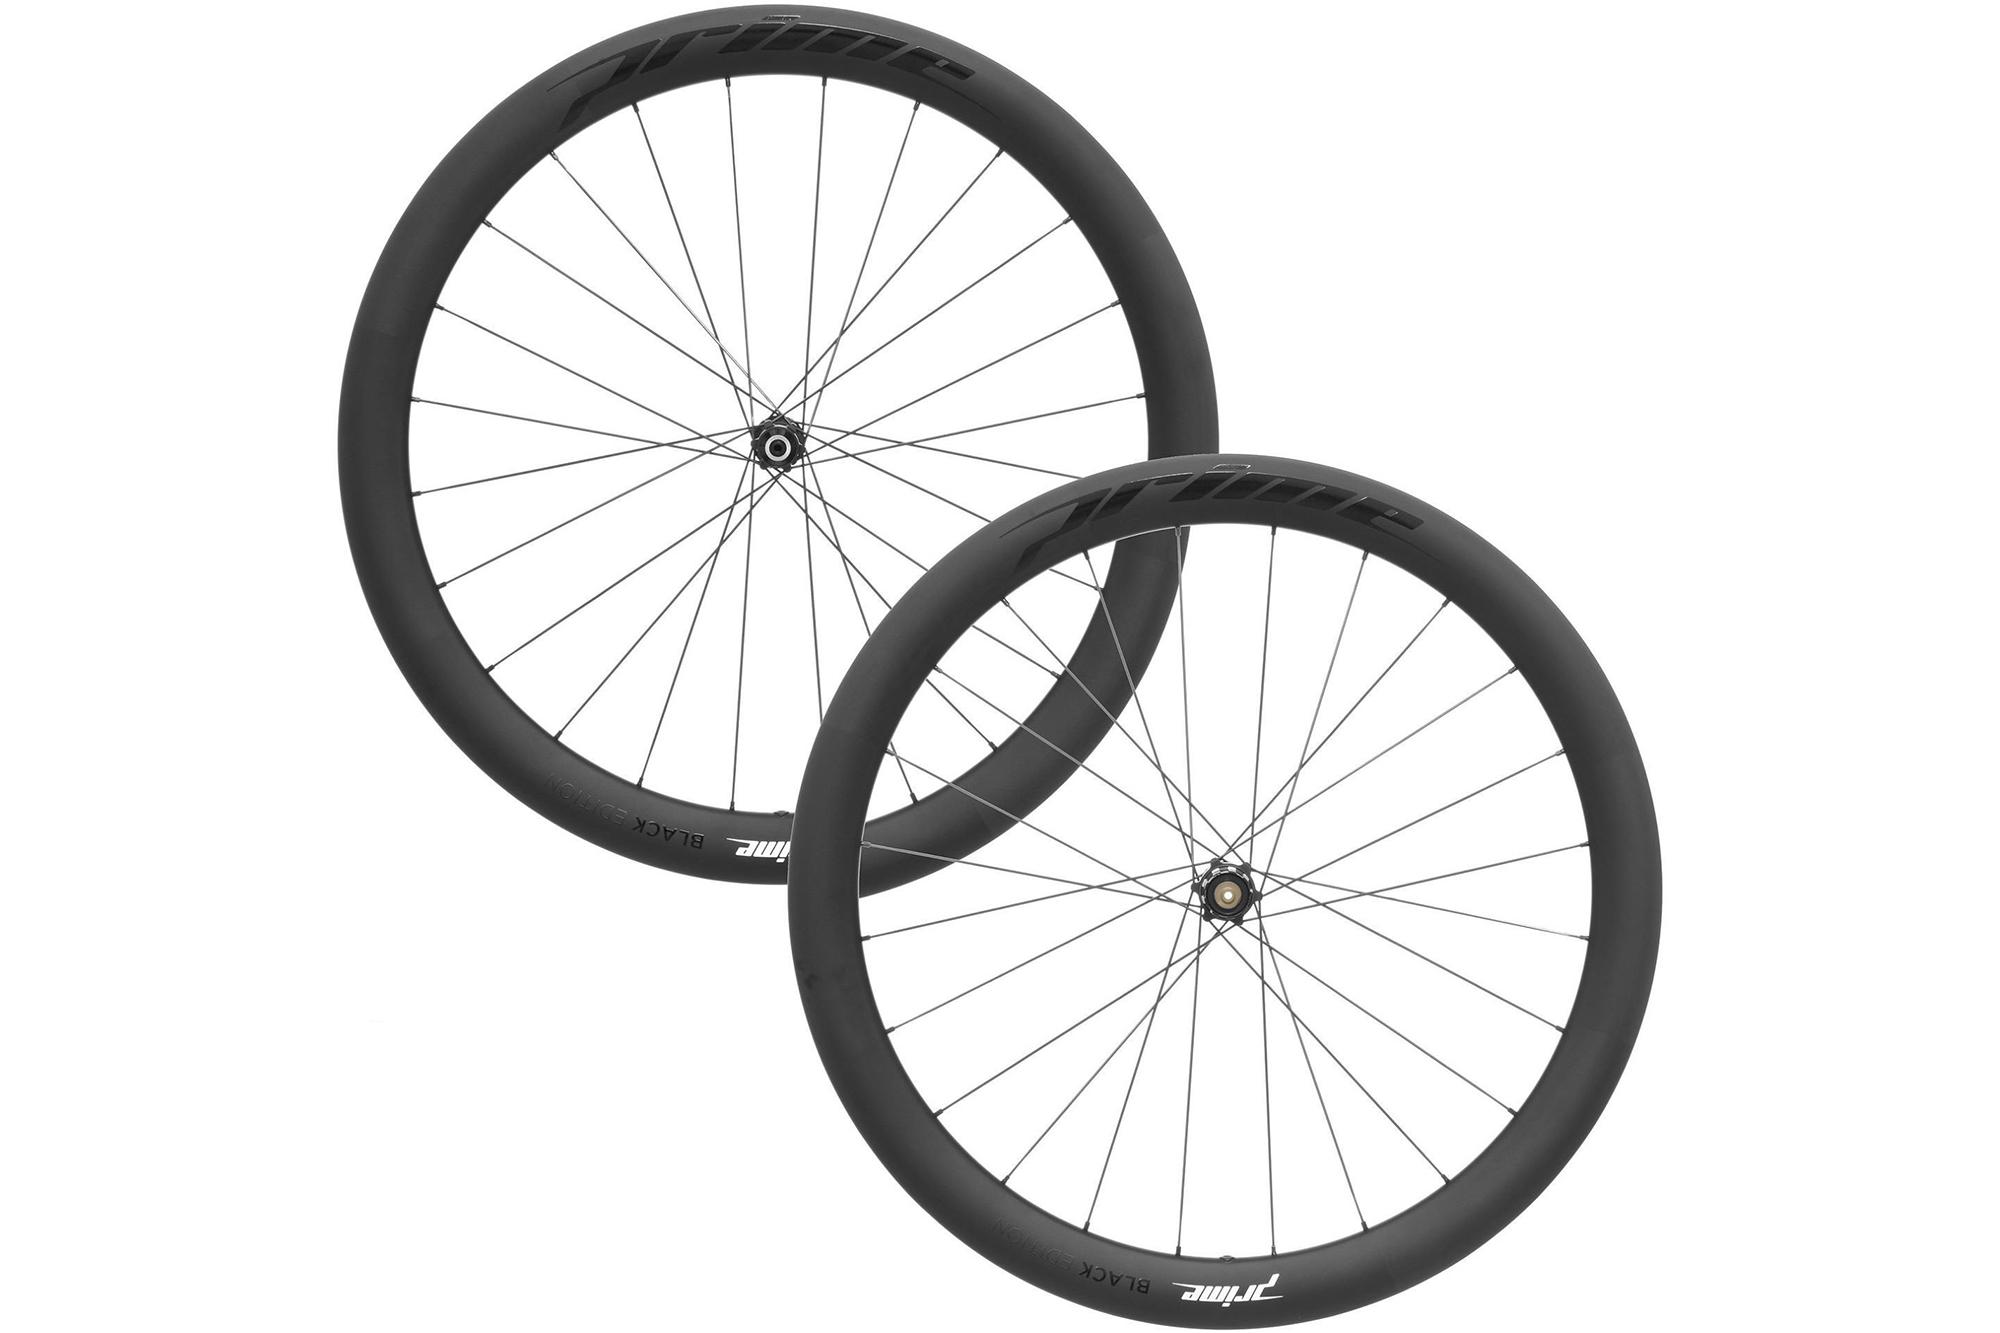 Prime RR50 BlackEdition X CeramicSpeed DB 50 wheelset